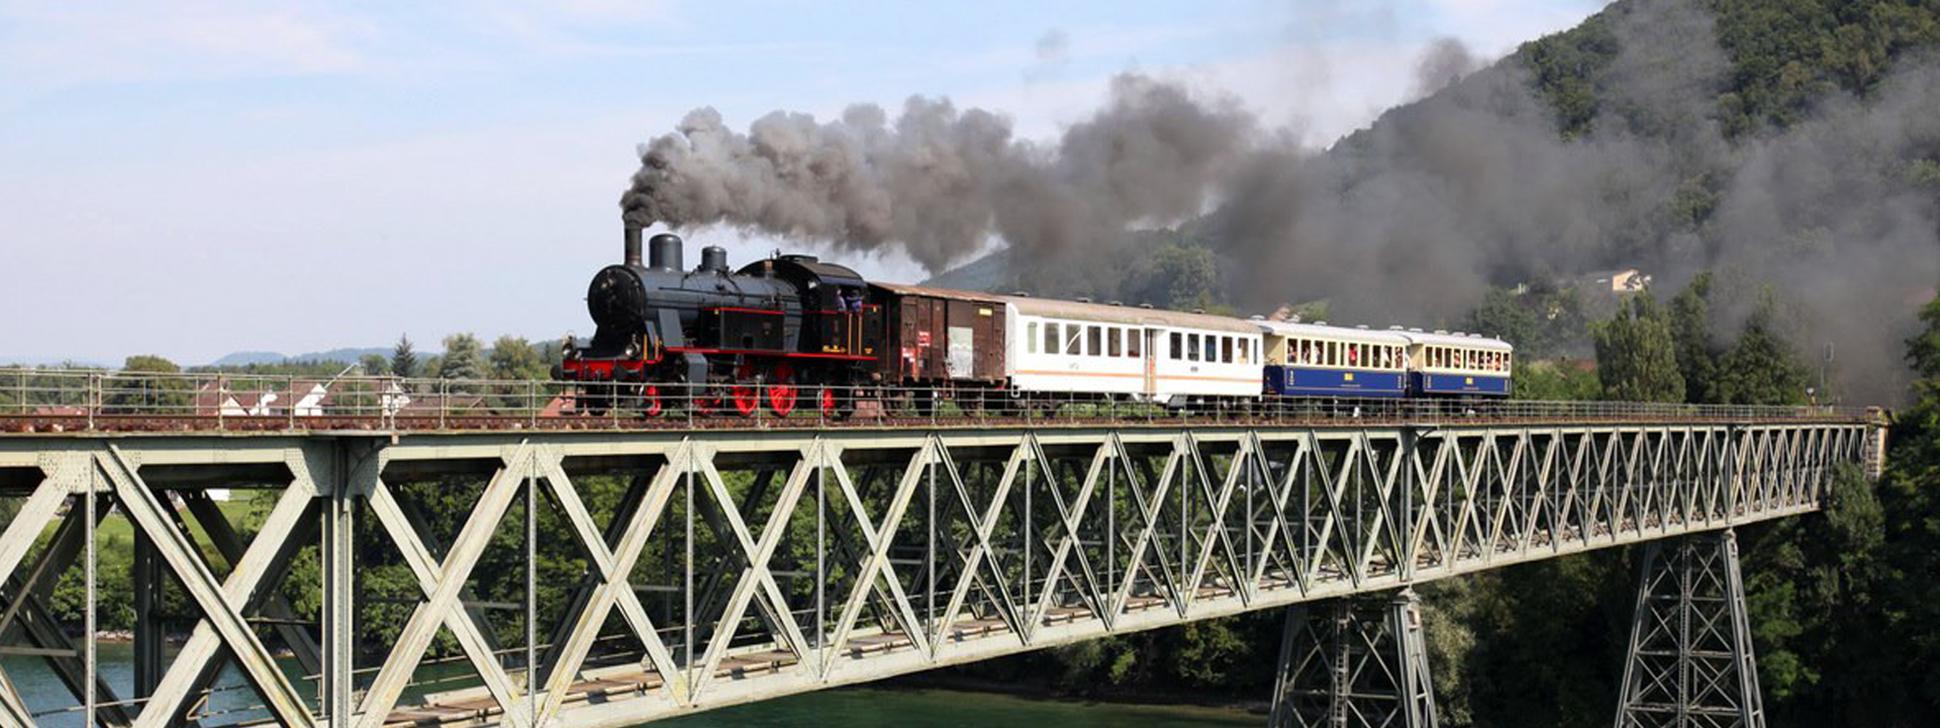 Sonderfahrt Eisenbahnbrücke Hemishofen